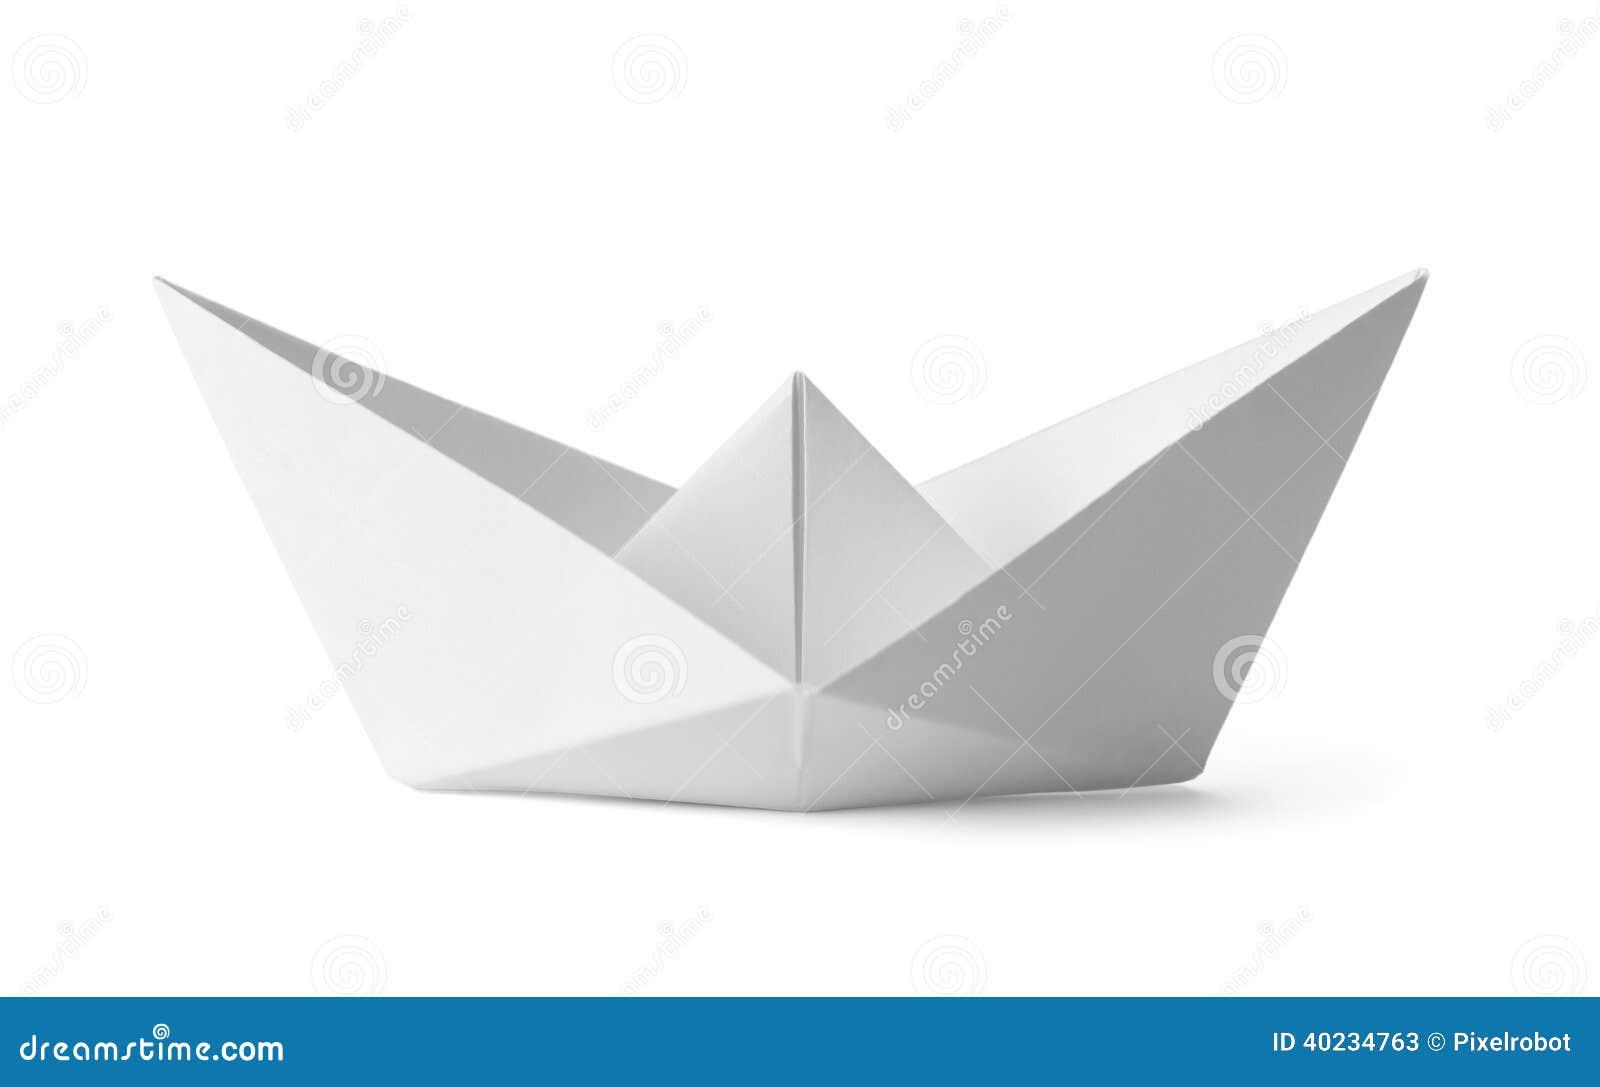 origami sailboat plans